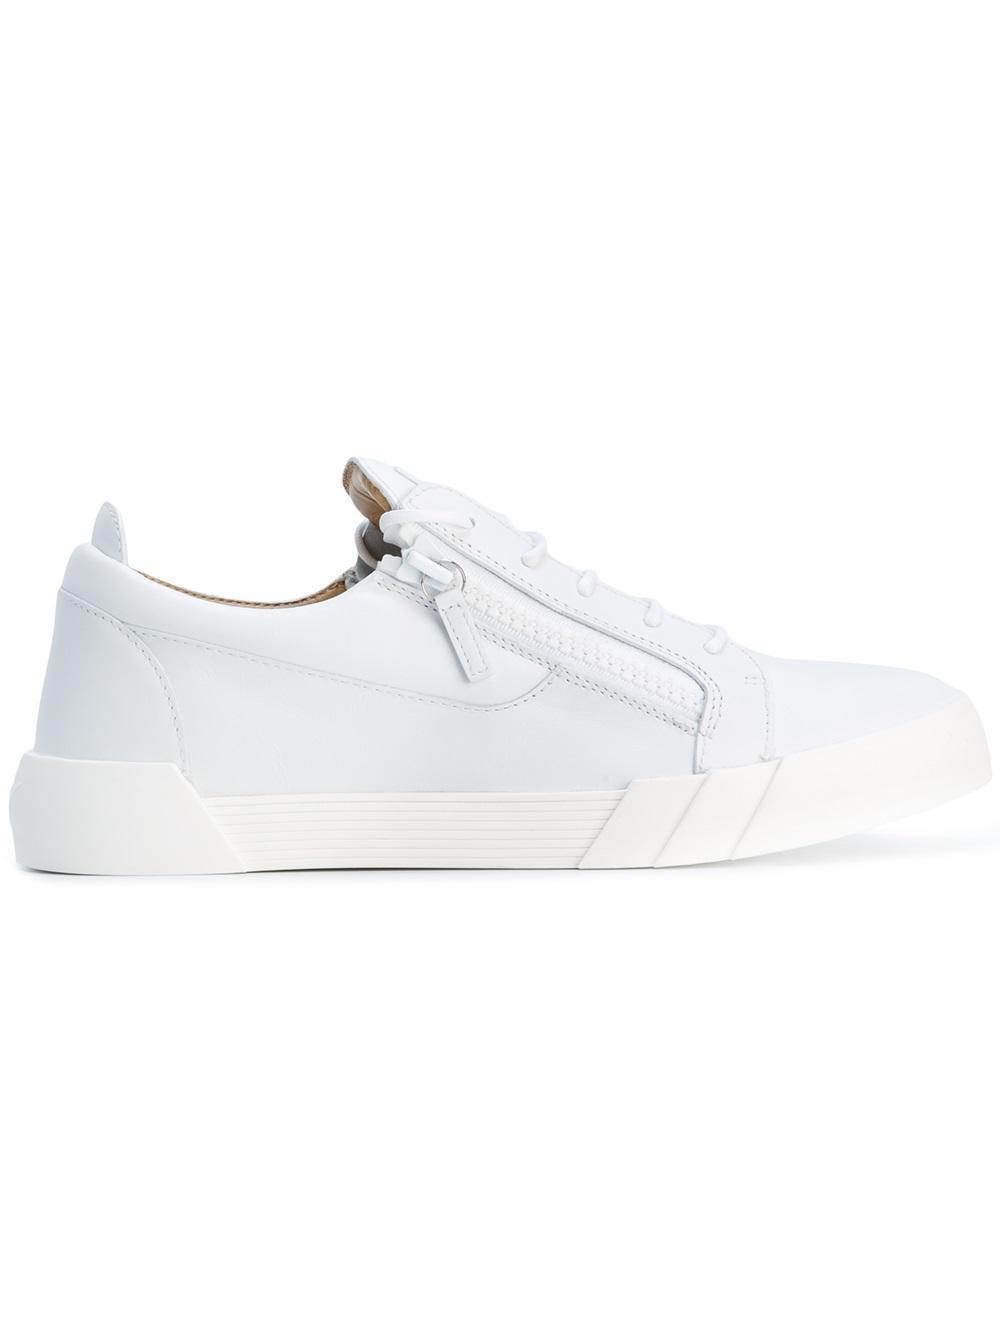 giuseppe zanotti zipped sneakers in white lyst